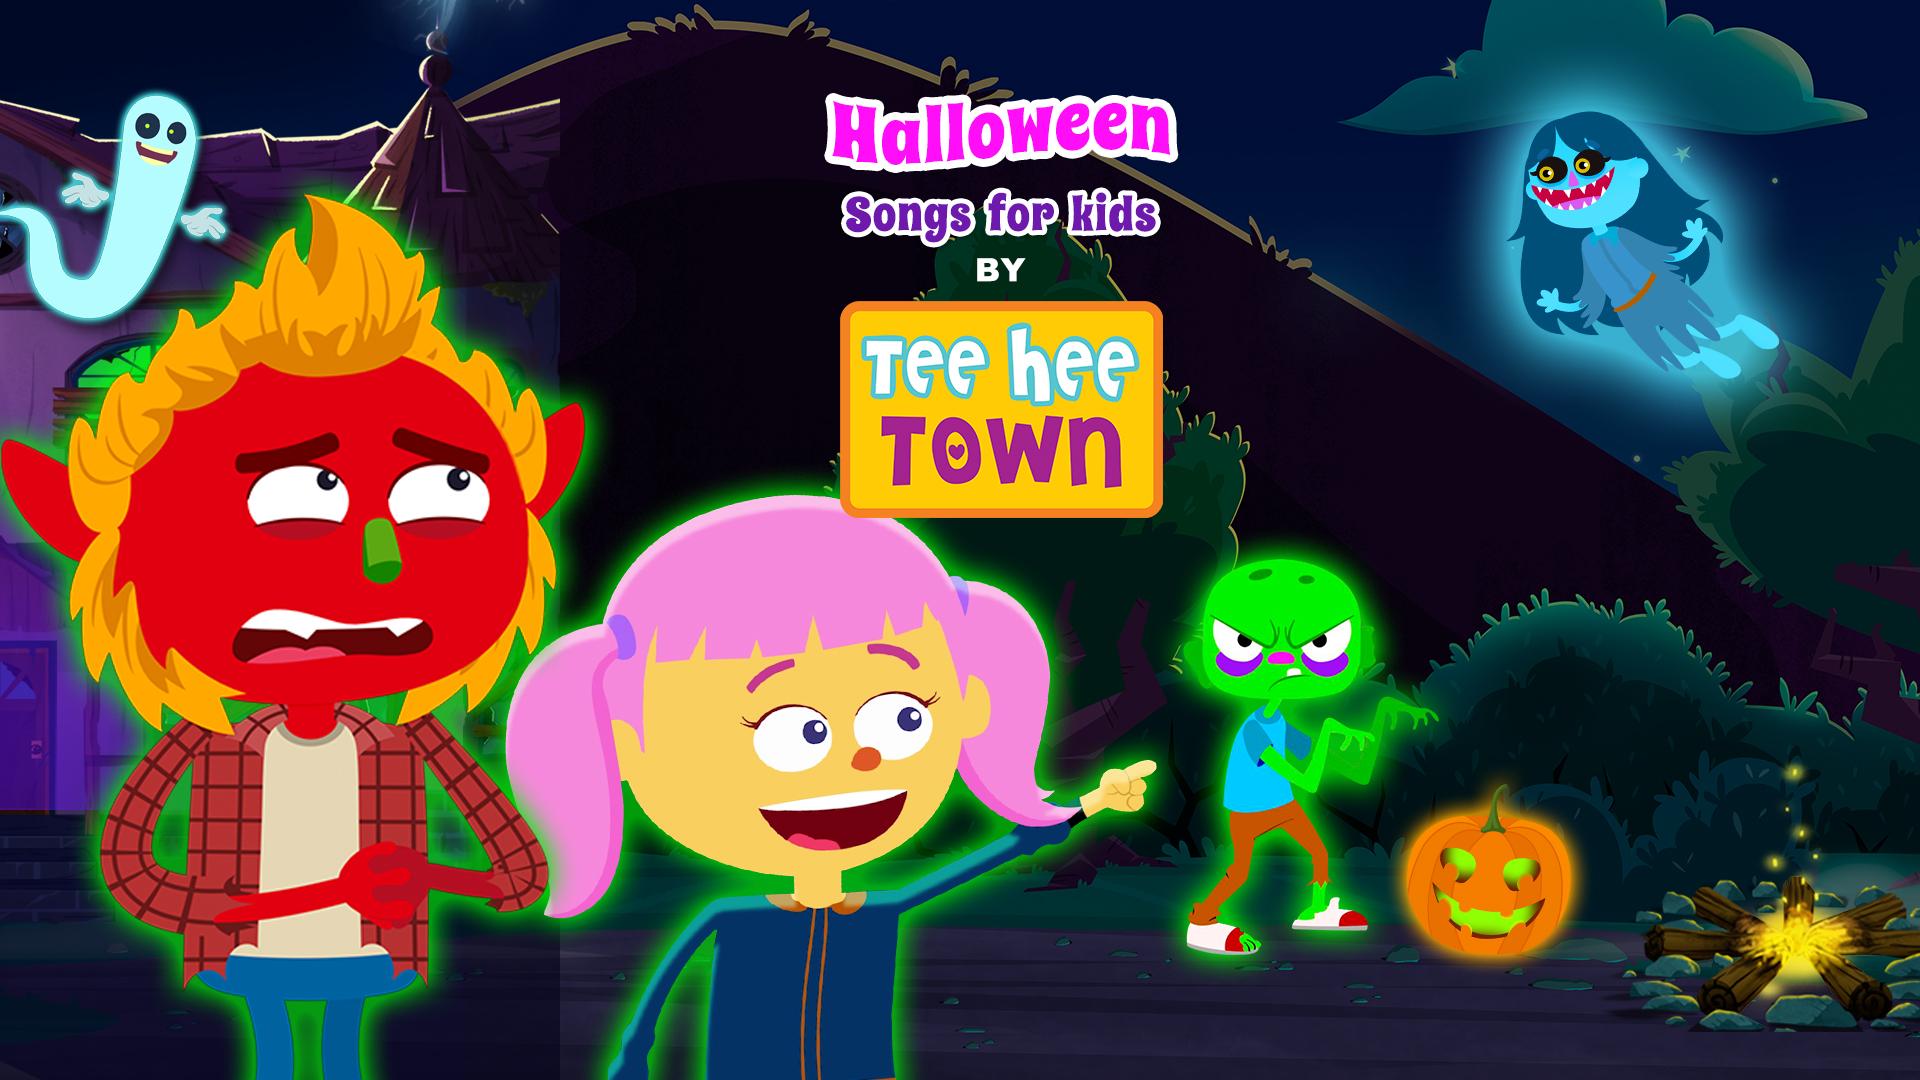 Halloween Songs for Kids by Teehee Town